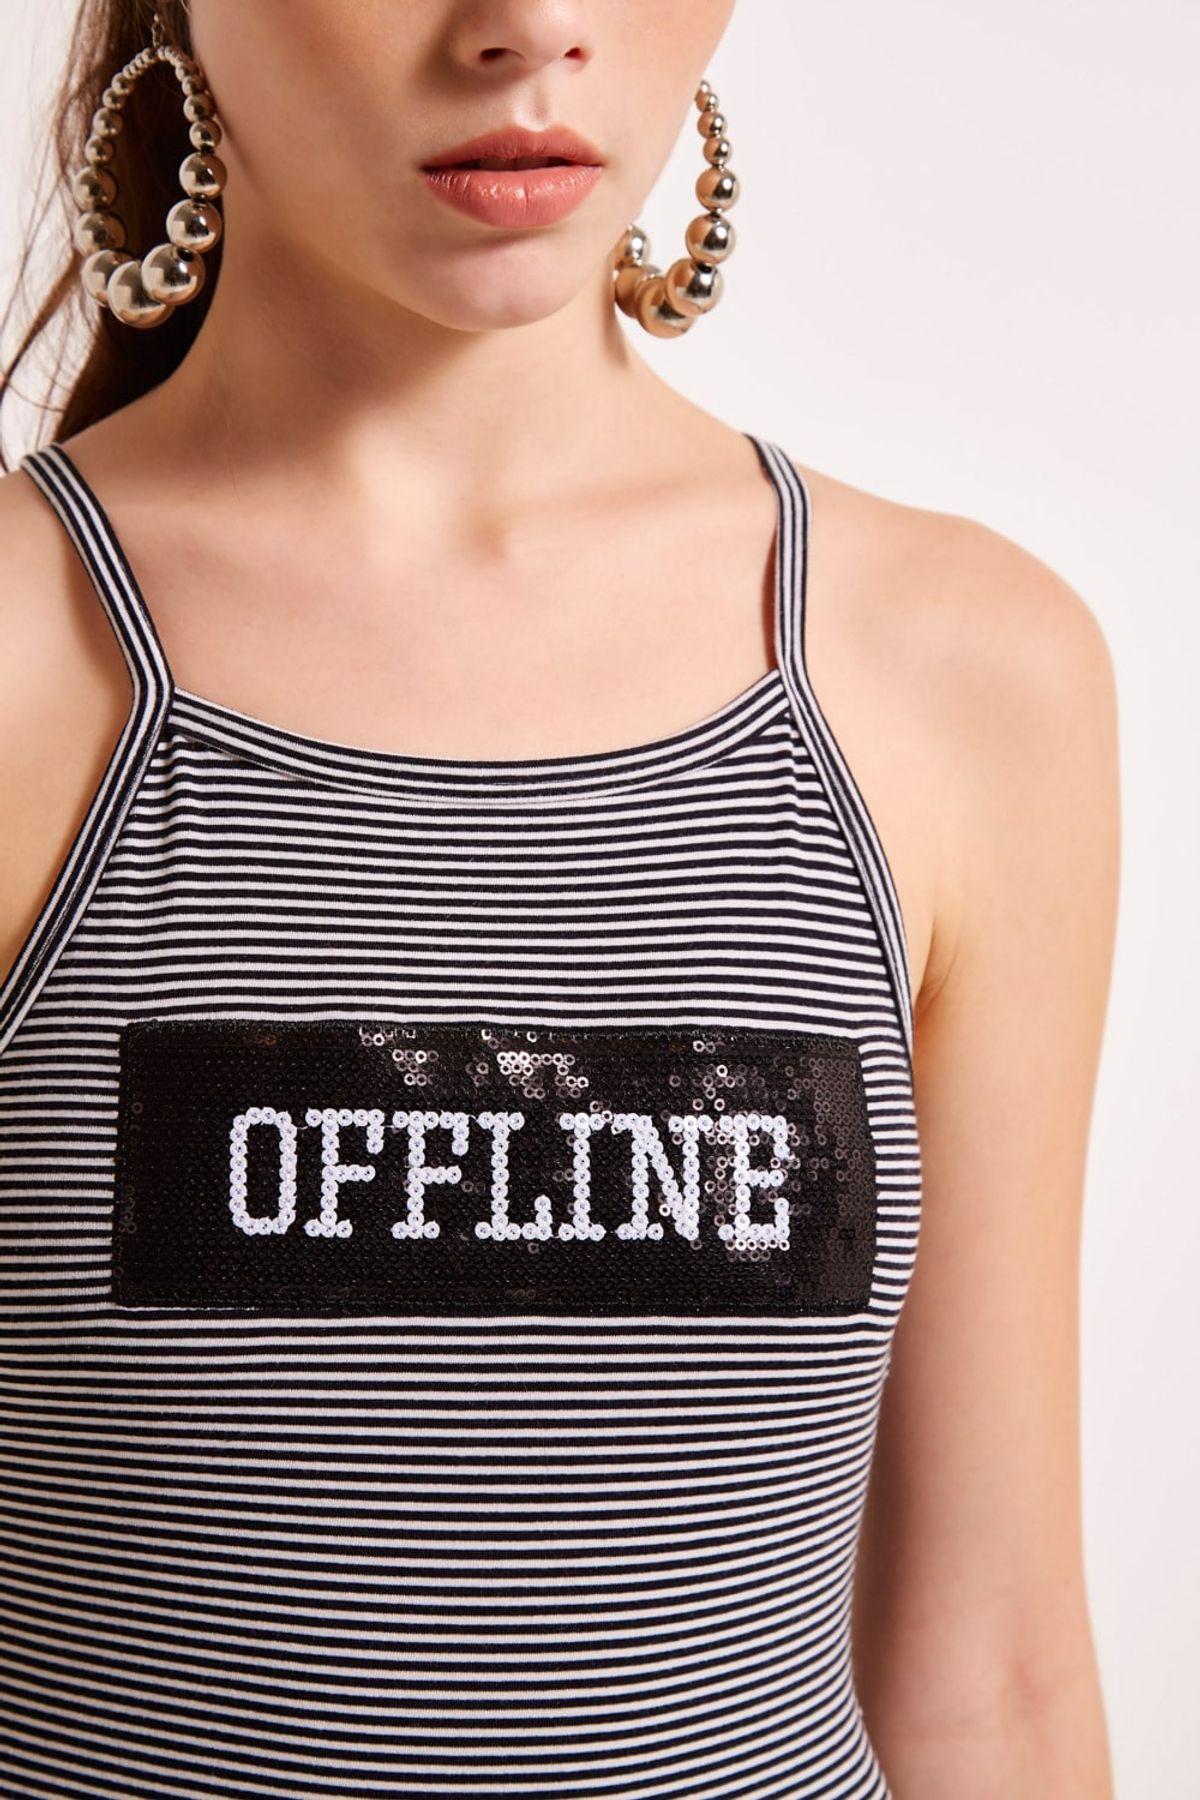 BODY-LISTRAS-OFFLINE-020191840556-OH-BOY